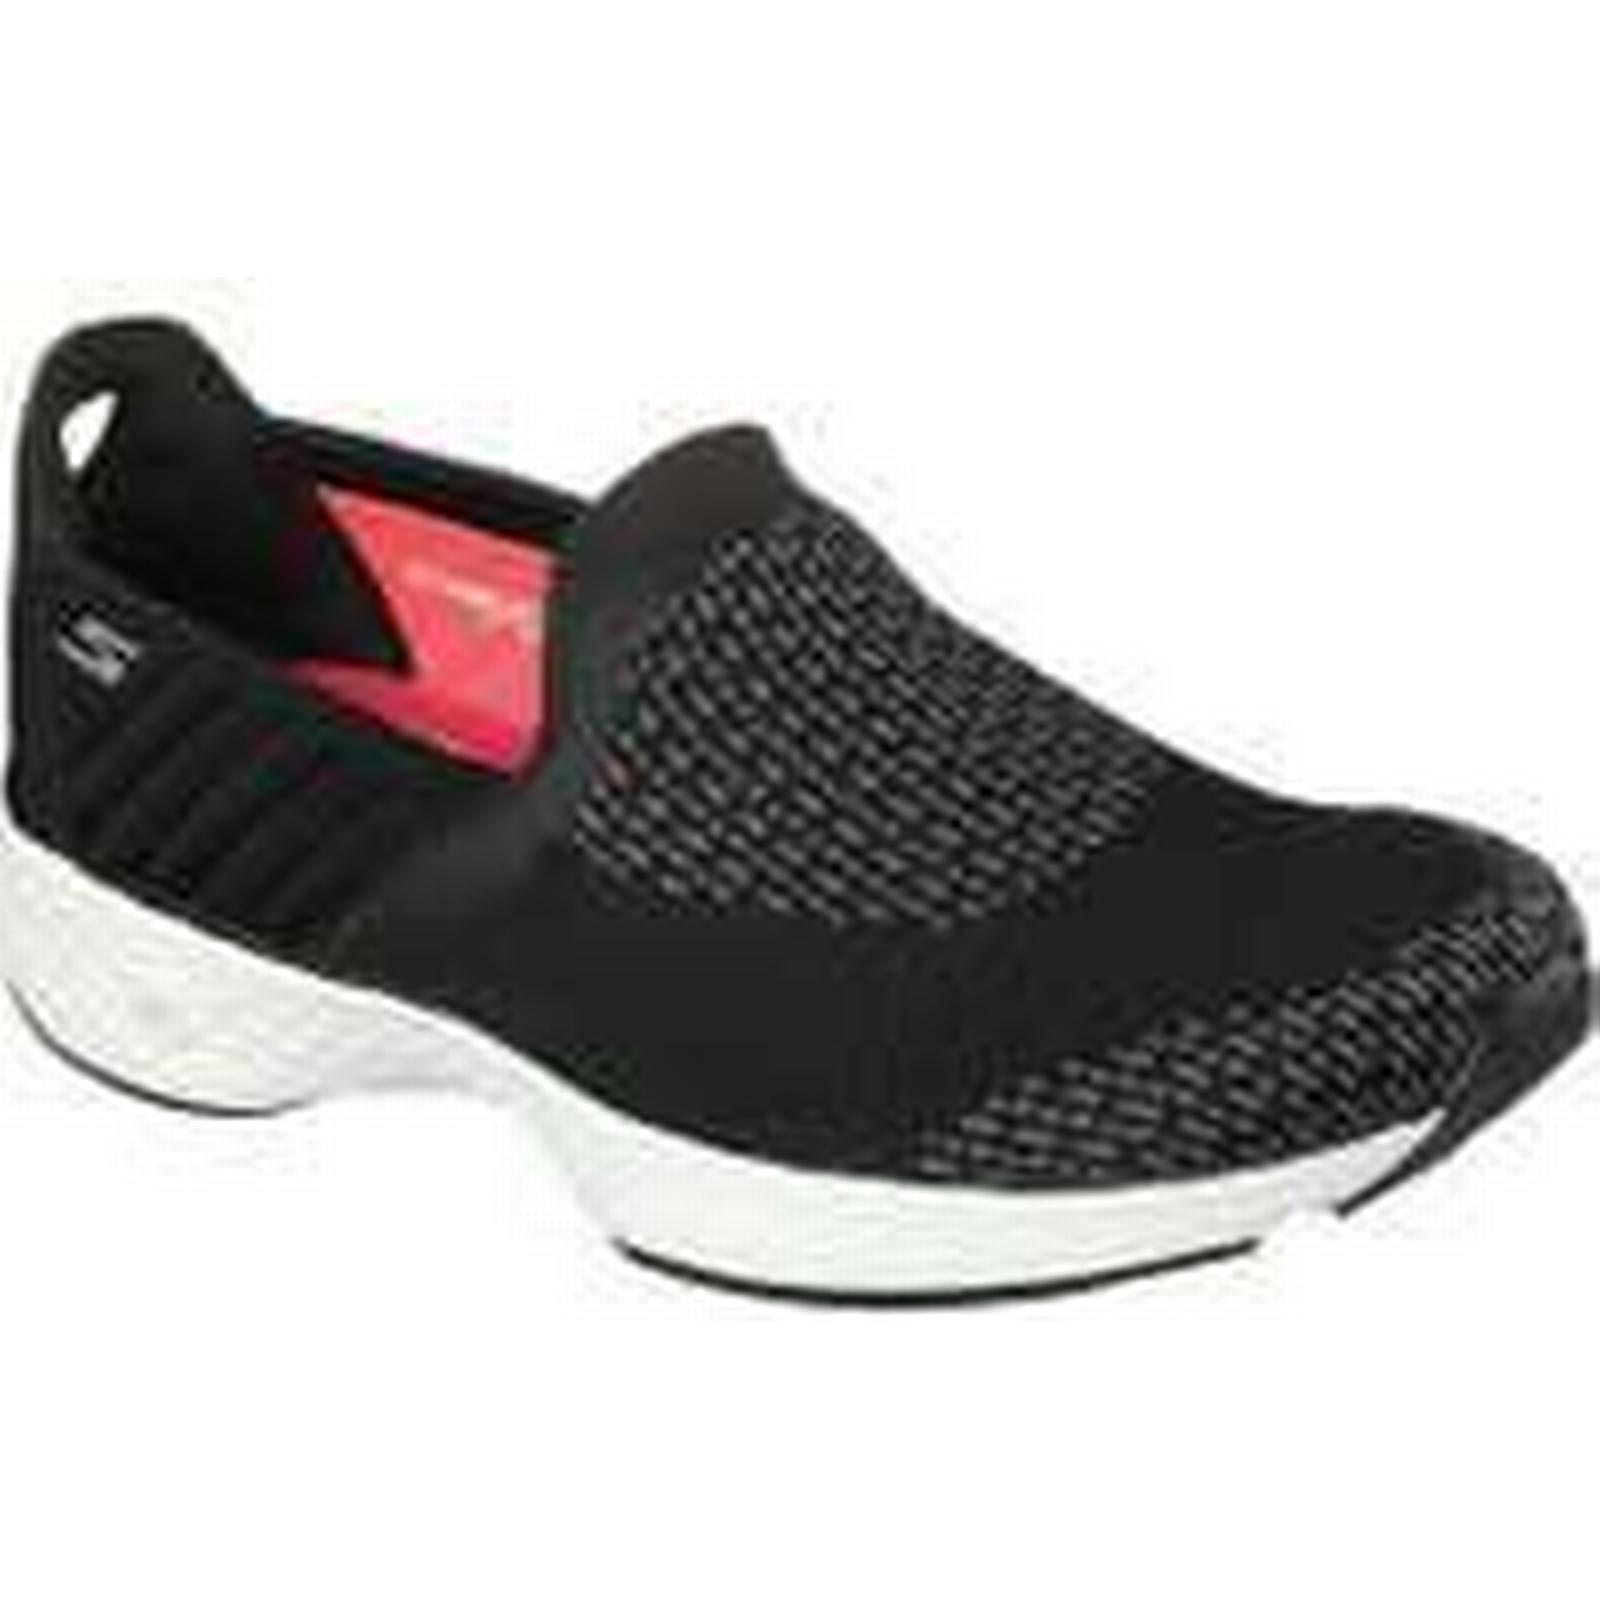 Skechers Go On Walk Sport Supreme Slip On Go Ladies Walking Shoes - Black/White, 6.5 UK a4963a